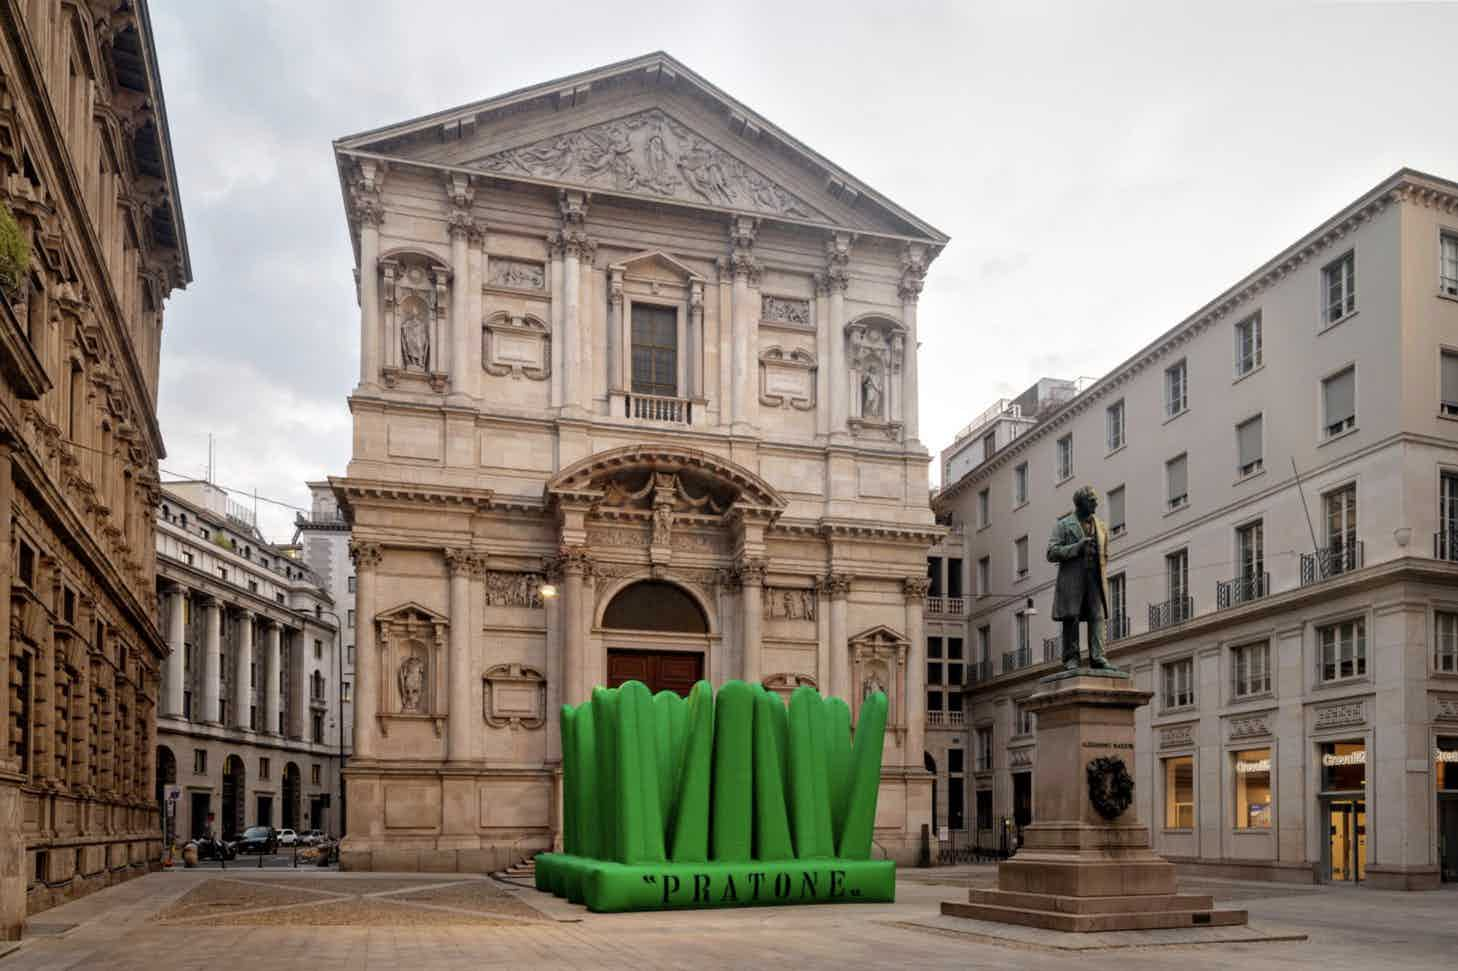 Super Pratone by Gufram Piazza San Fedele Photography Roberto Conte